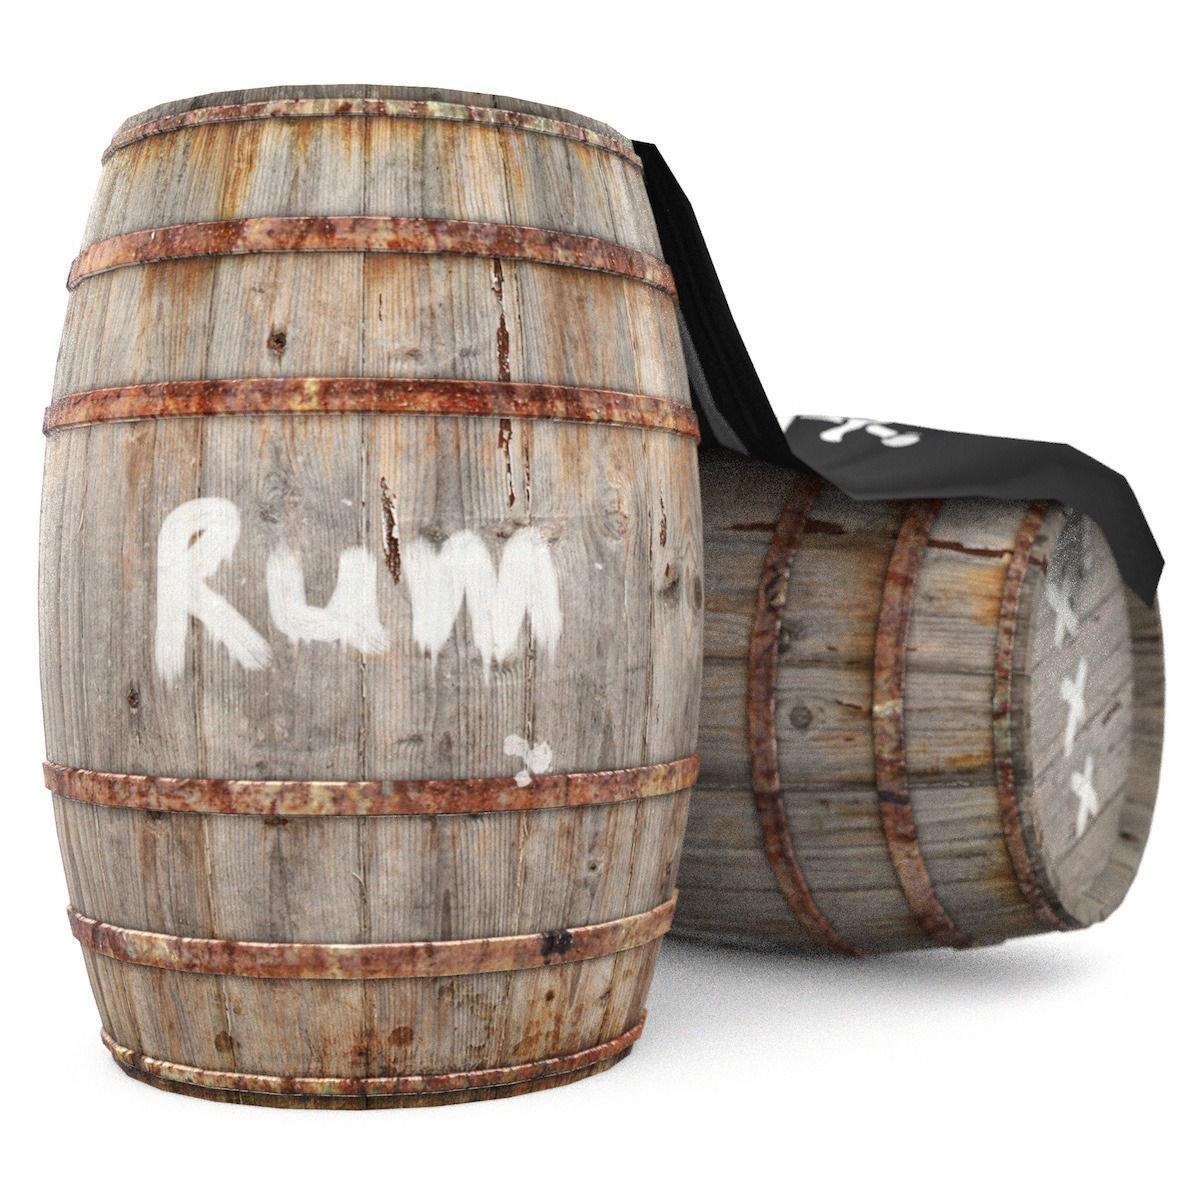 Wood, Jamaican Rum Barrel Chip 1lb